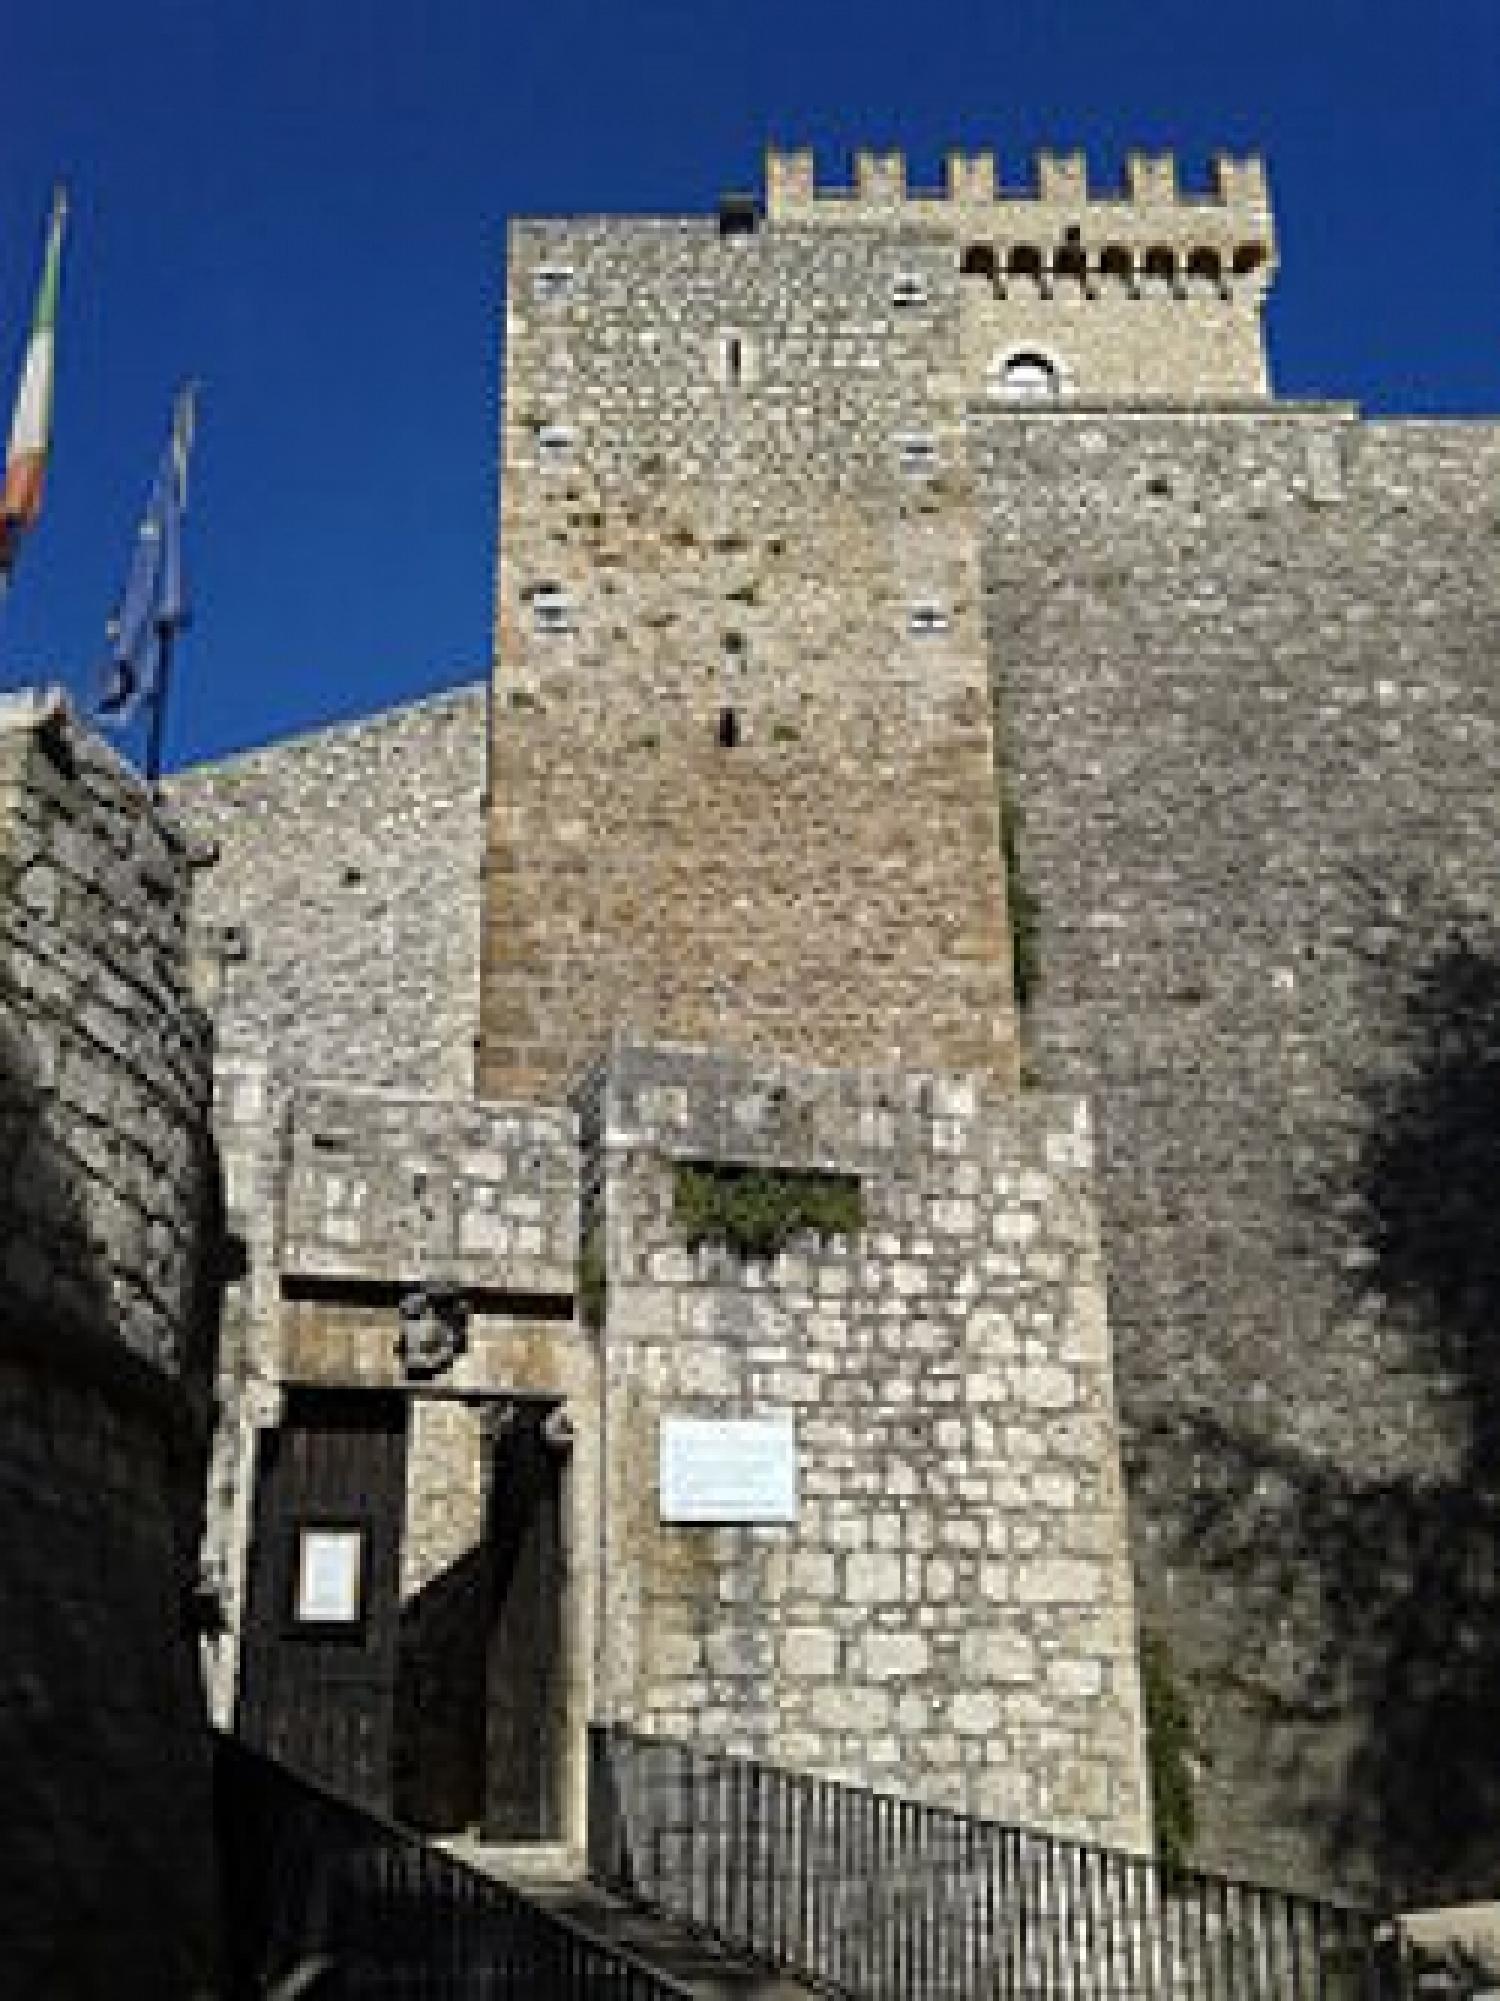 225px-Celano_museo_arte_sacra_Marsica.jpg